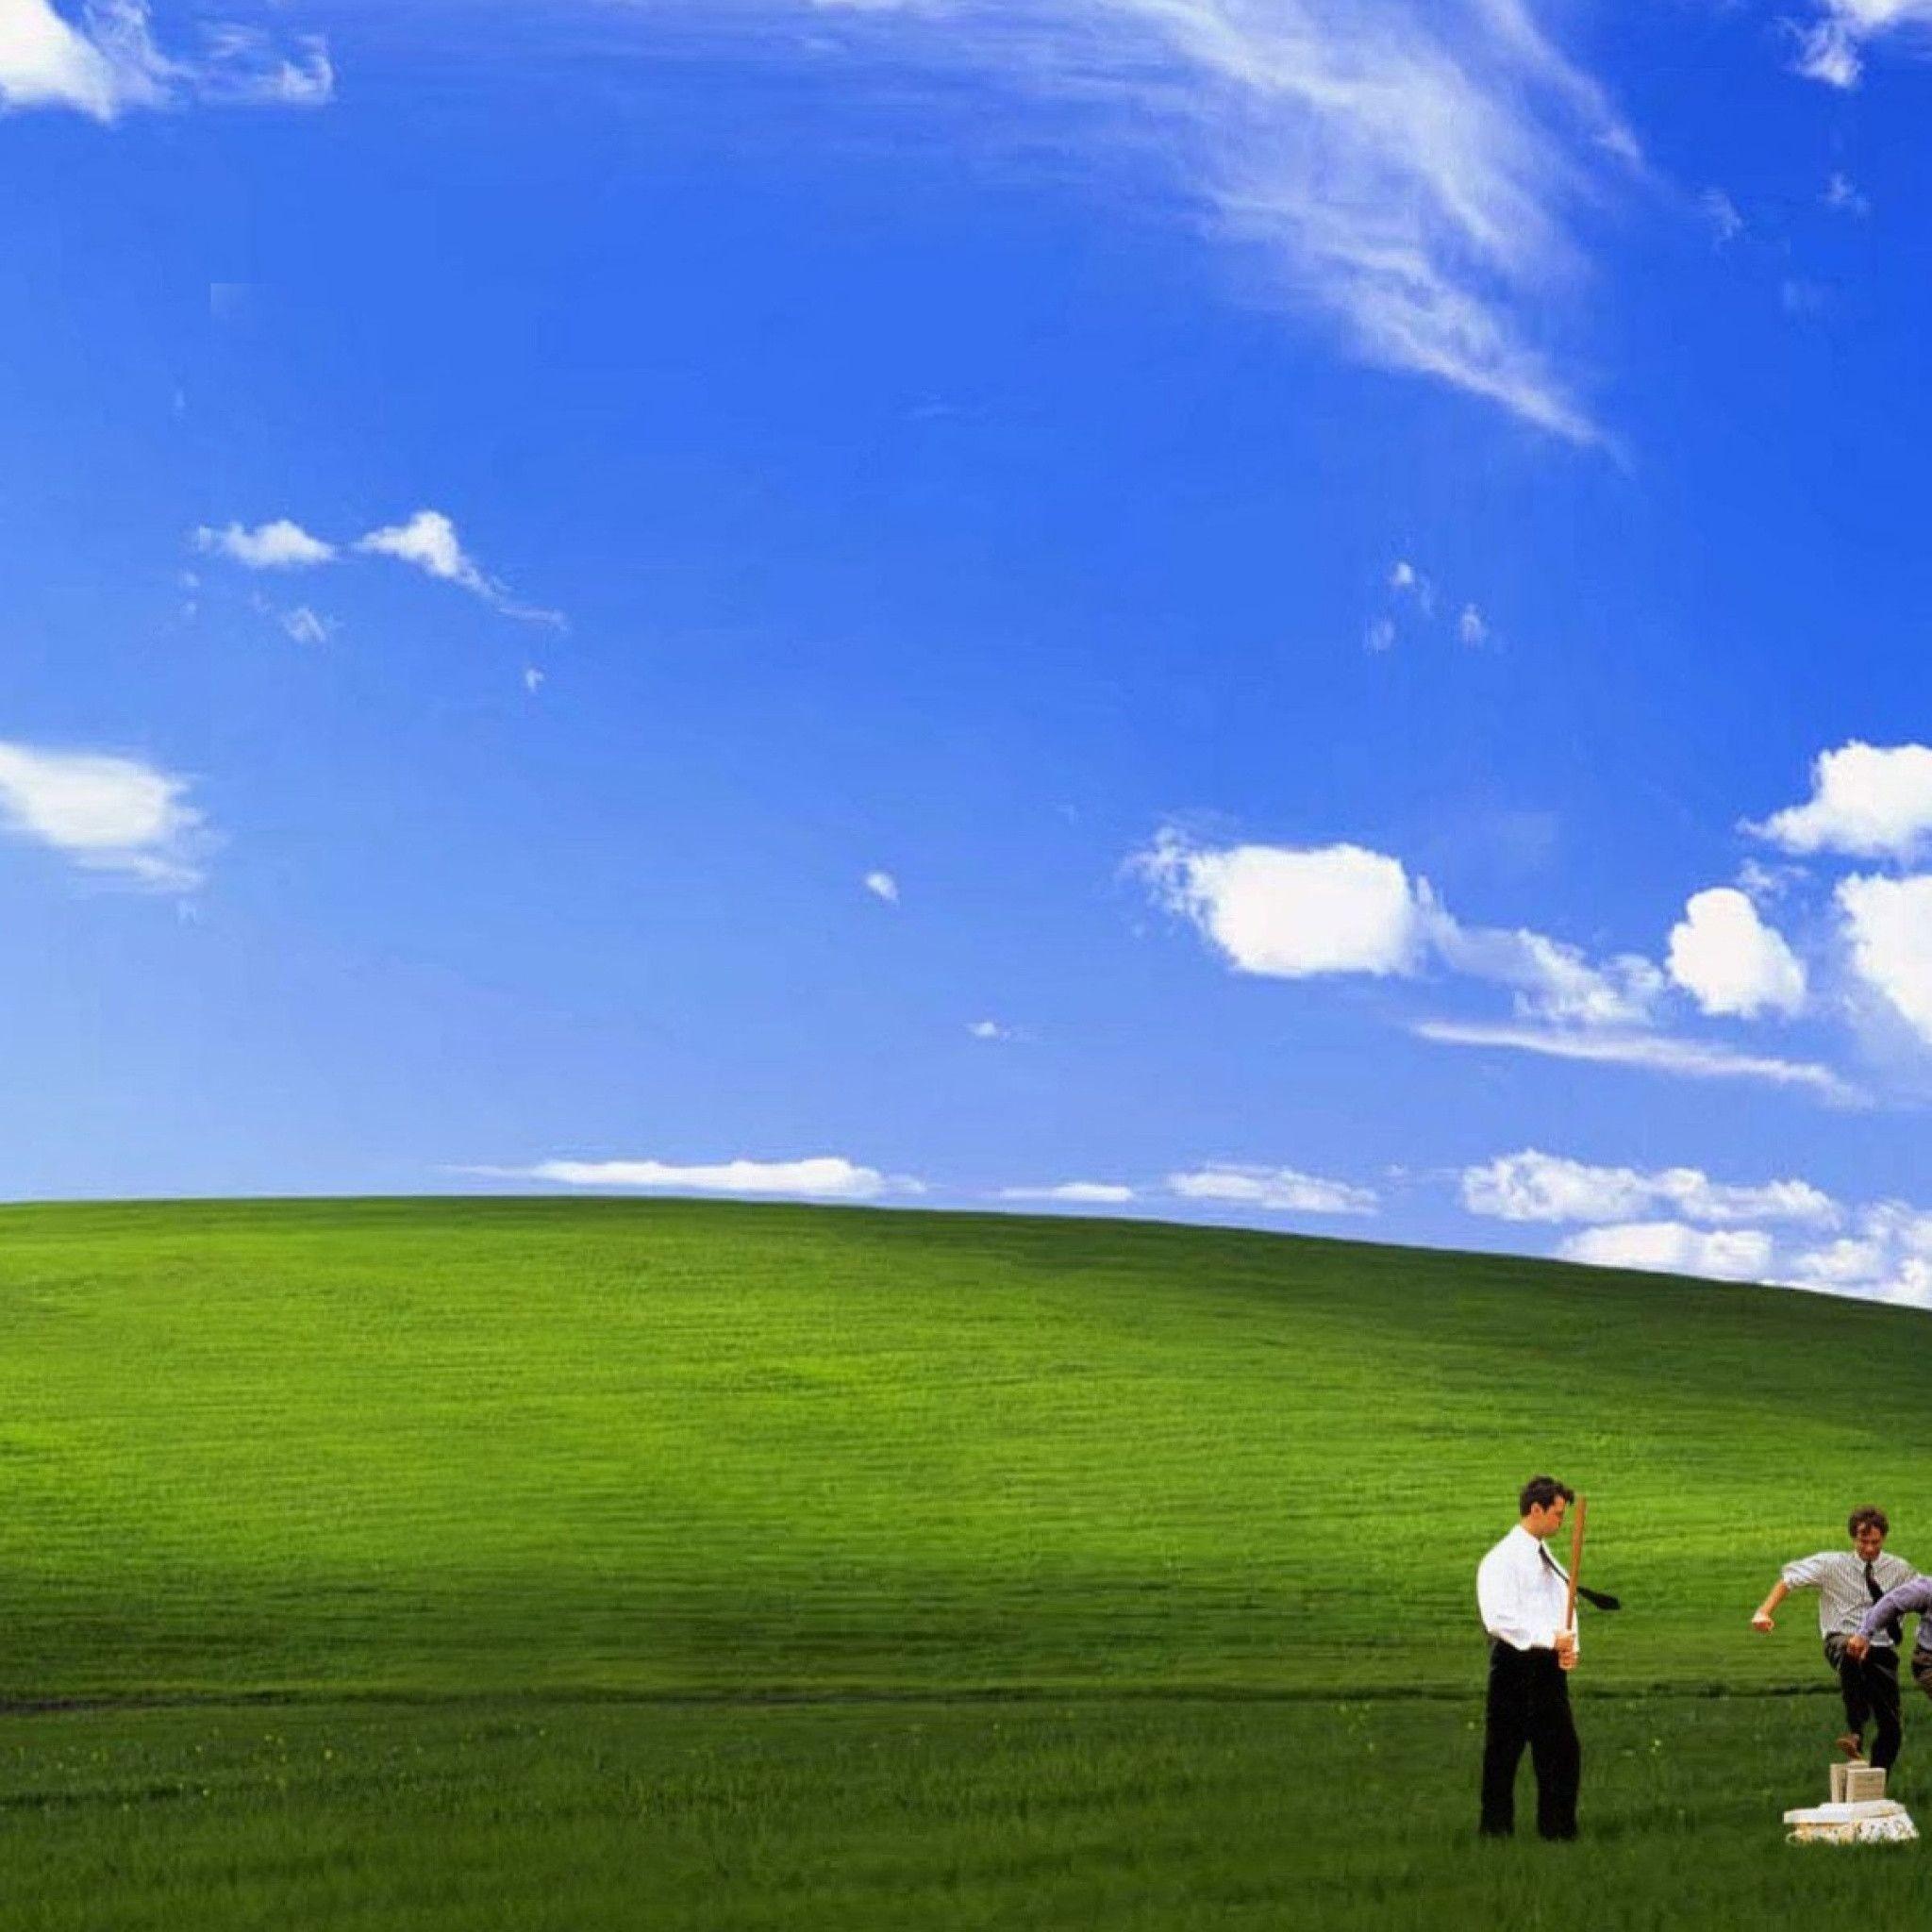 2048x2048 High Resolution Microsoft Windows XP Wallpapers HD 10 Full Size